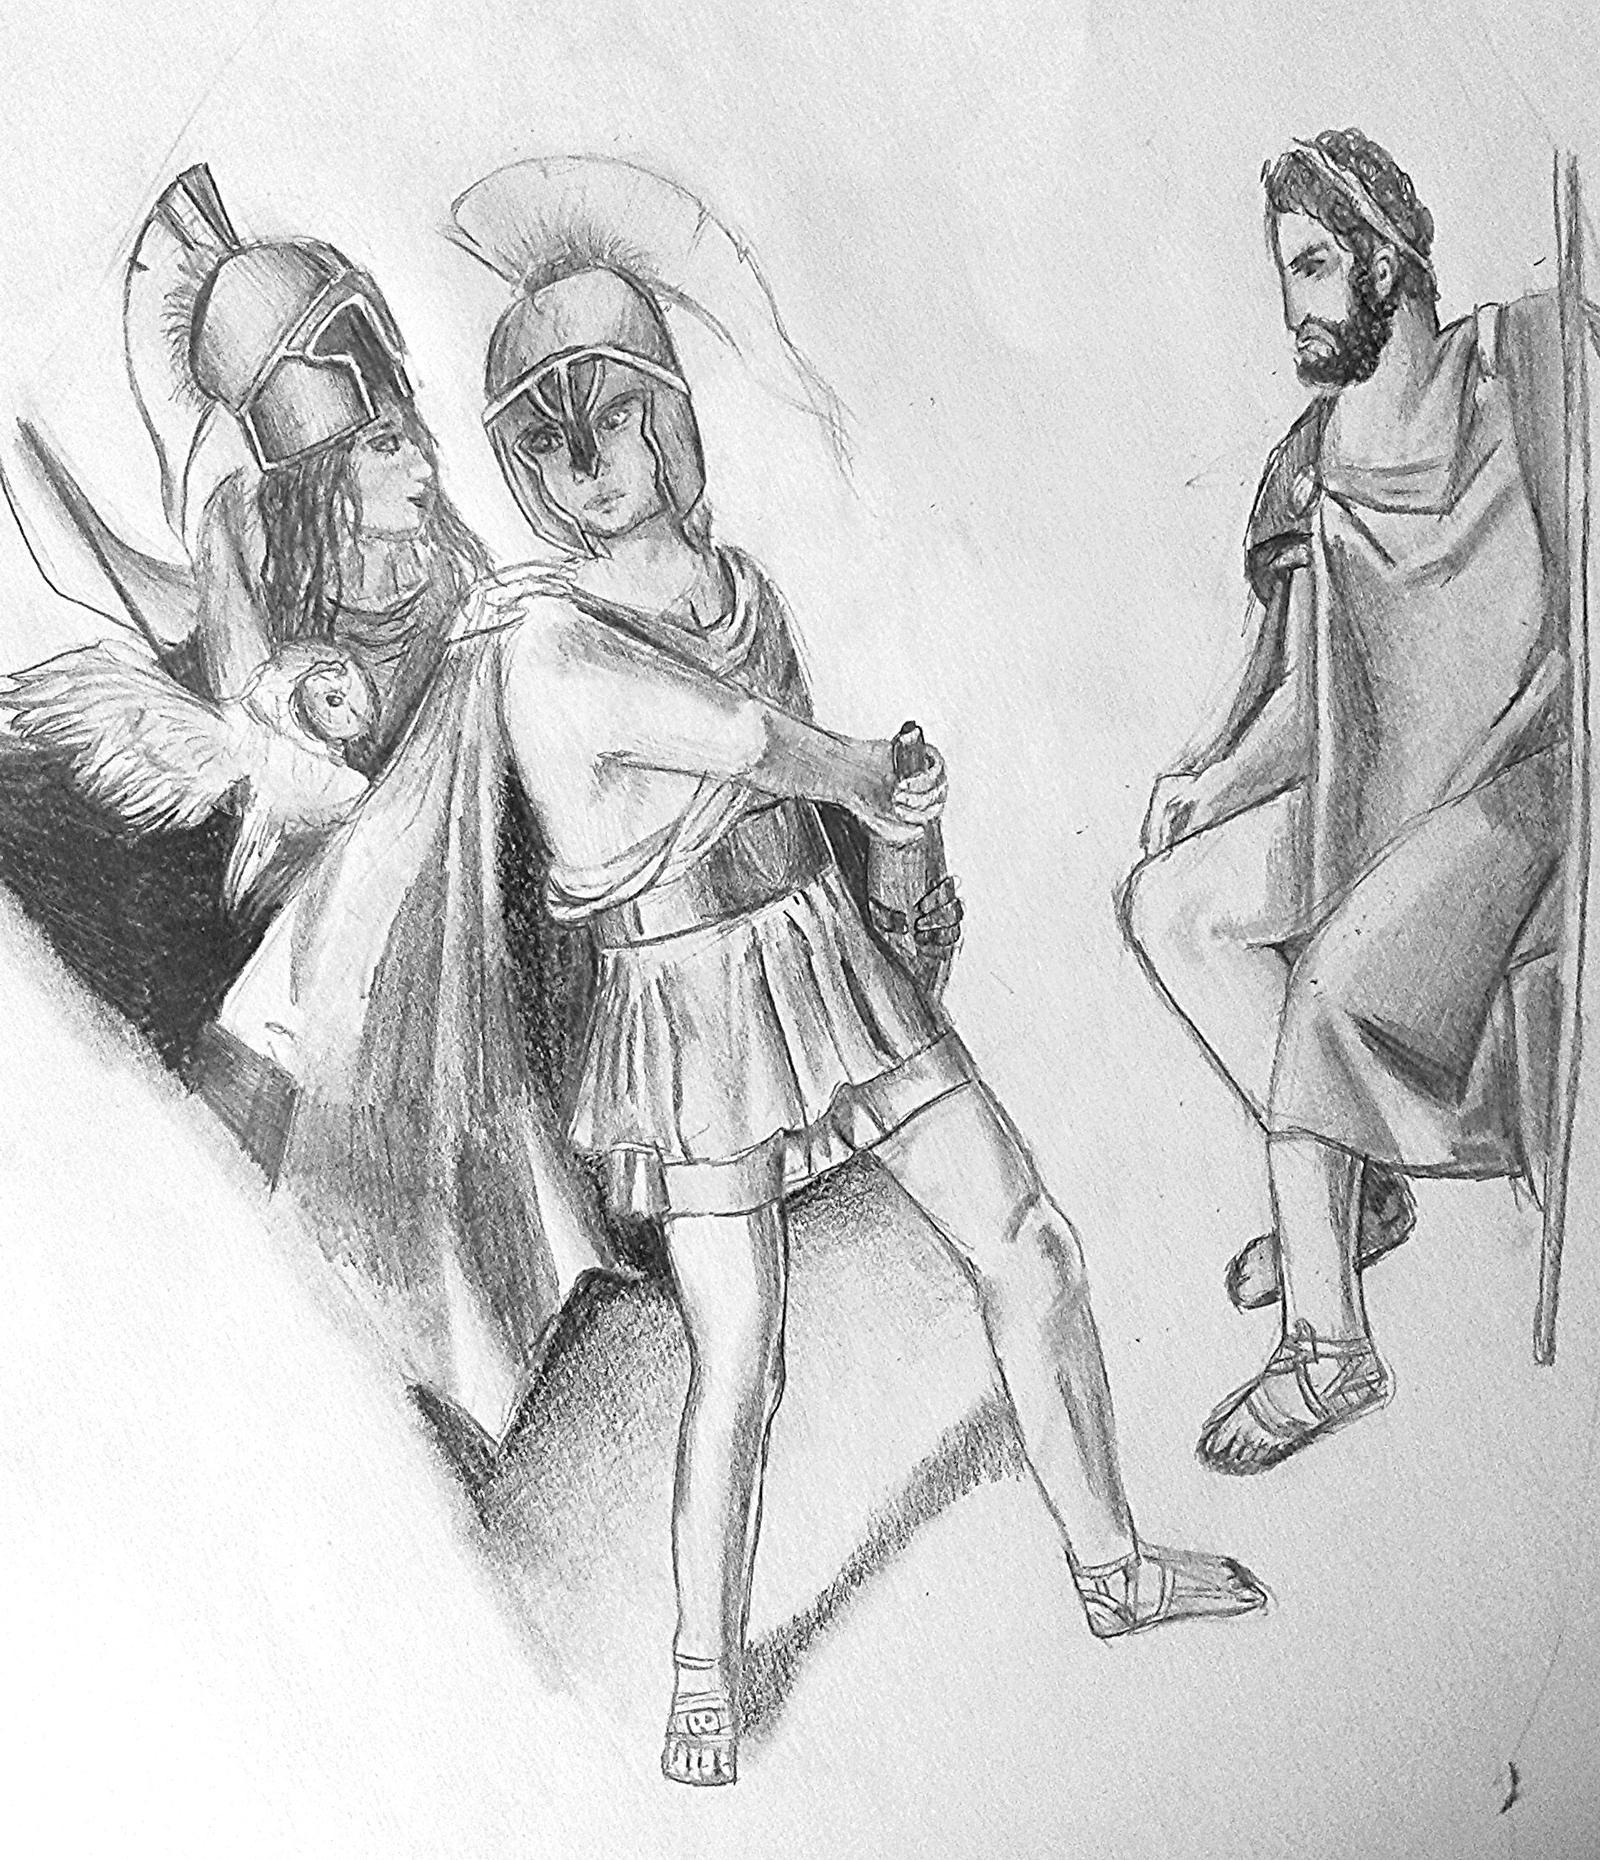 Sardar puran singh essays